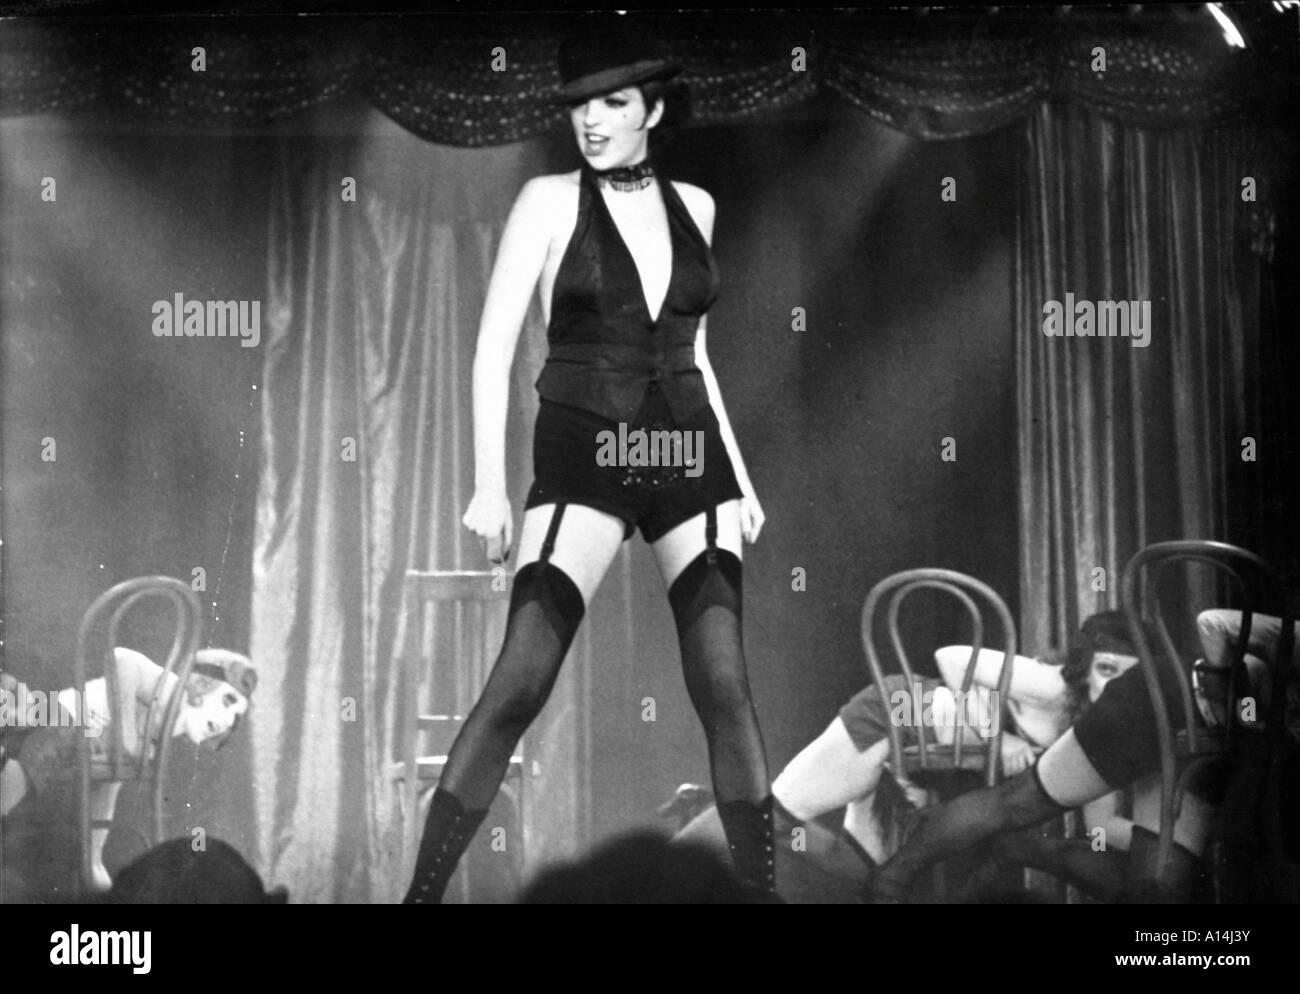 Kabarett 1972 Bob Fosse Liza Minnelli Stockfoto Bild 10141646 Alamy